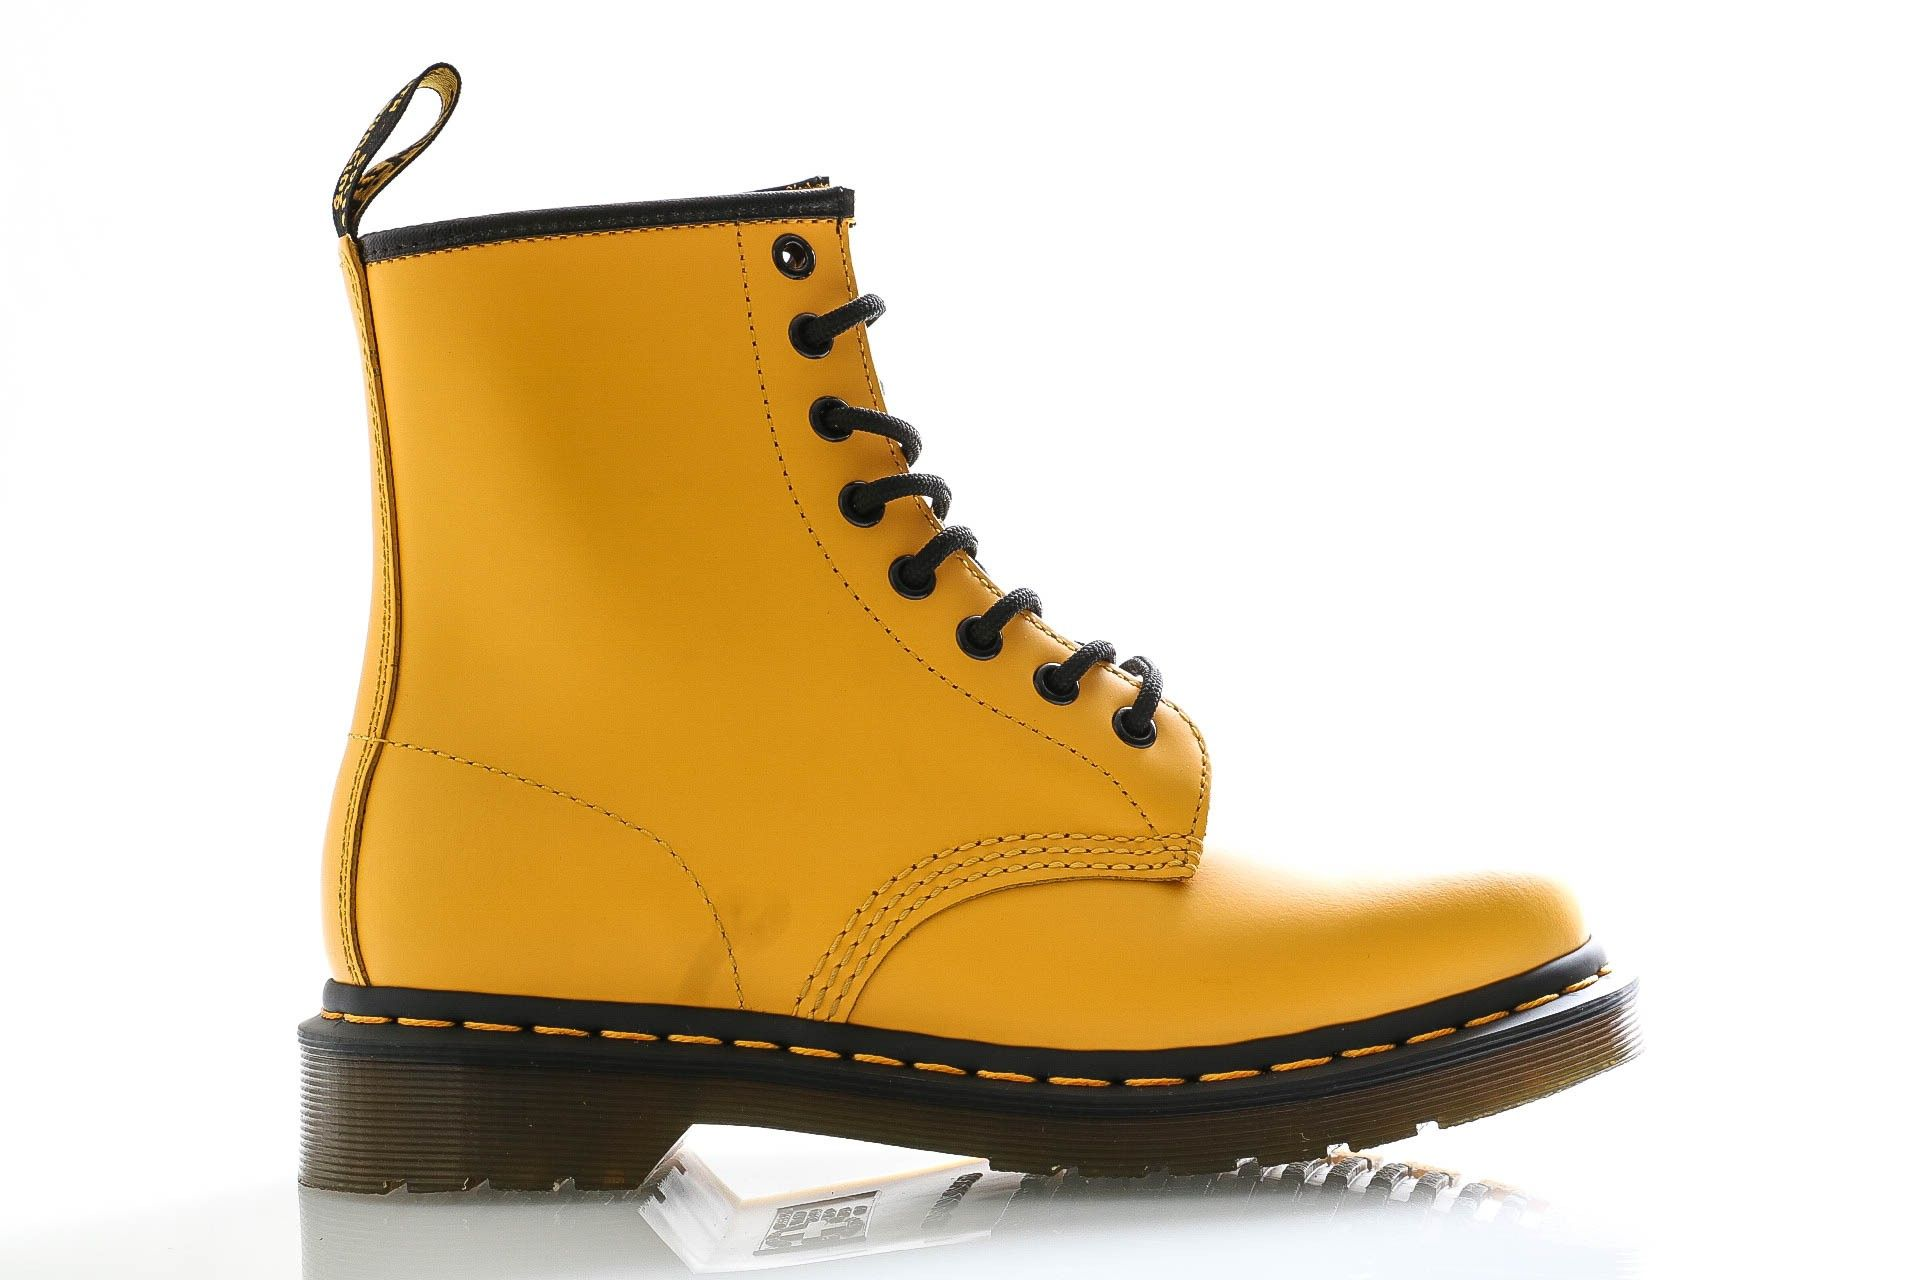 Afbeelding van Dr. Martens Boots 1460 Yellow Smooth 24614700